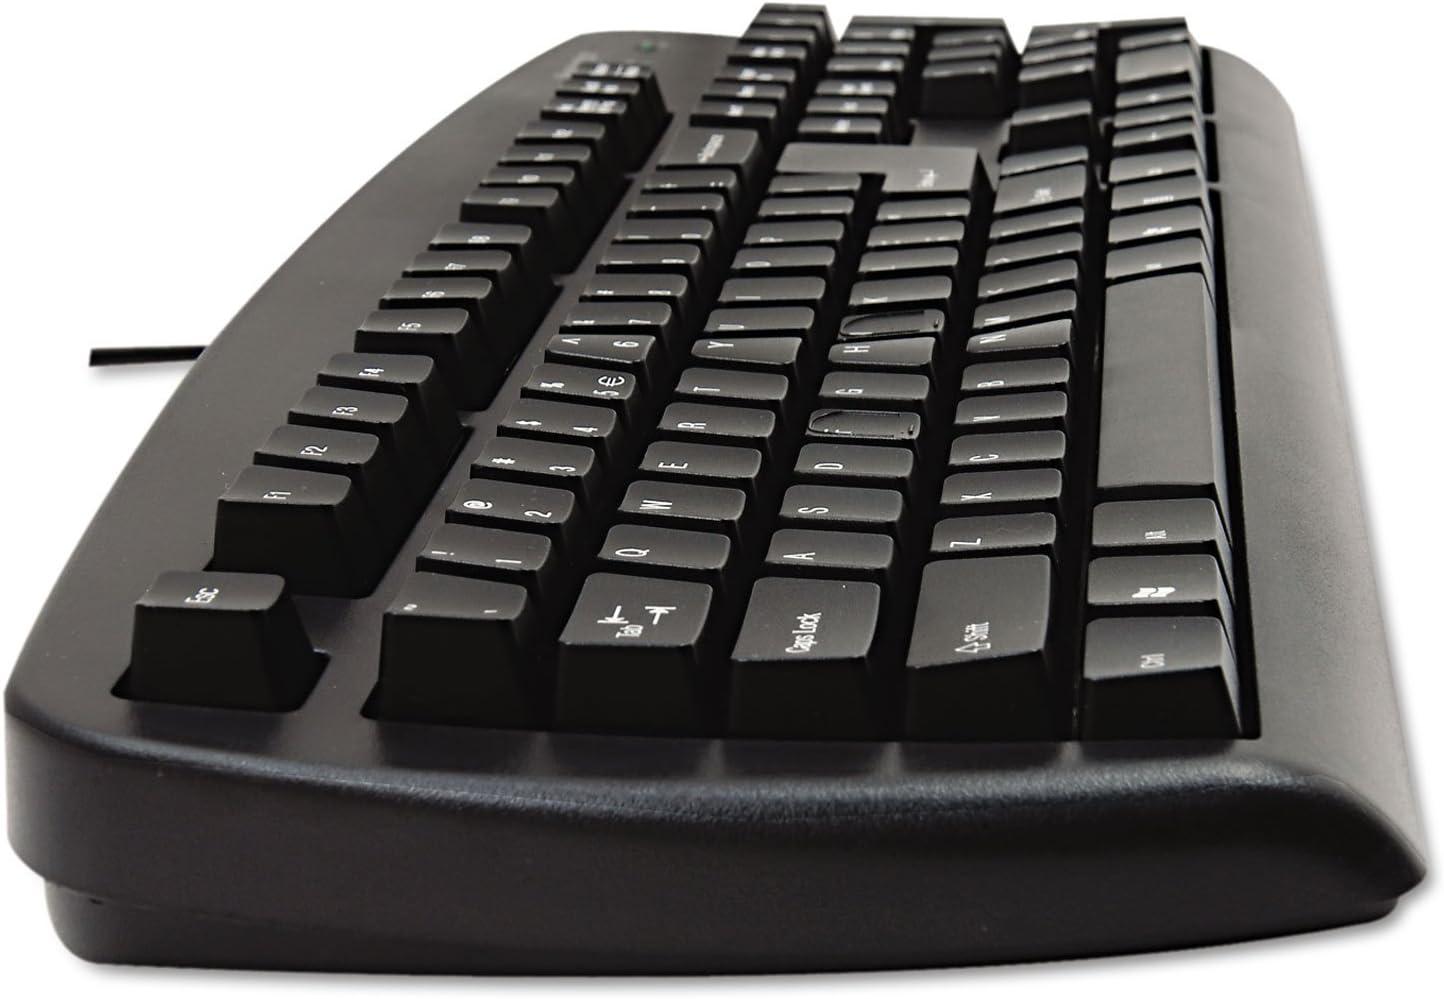 Black Kensington 64338 Comfort Type USB Keyboard 104 Keys